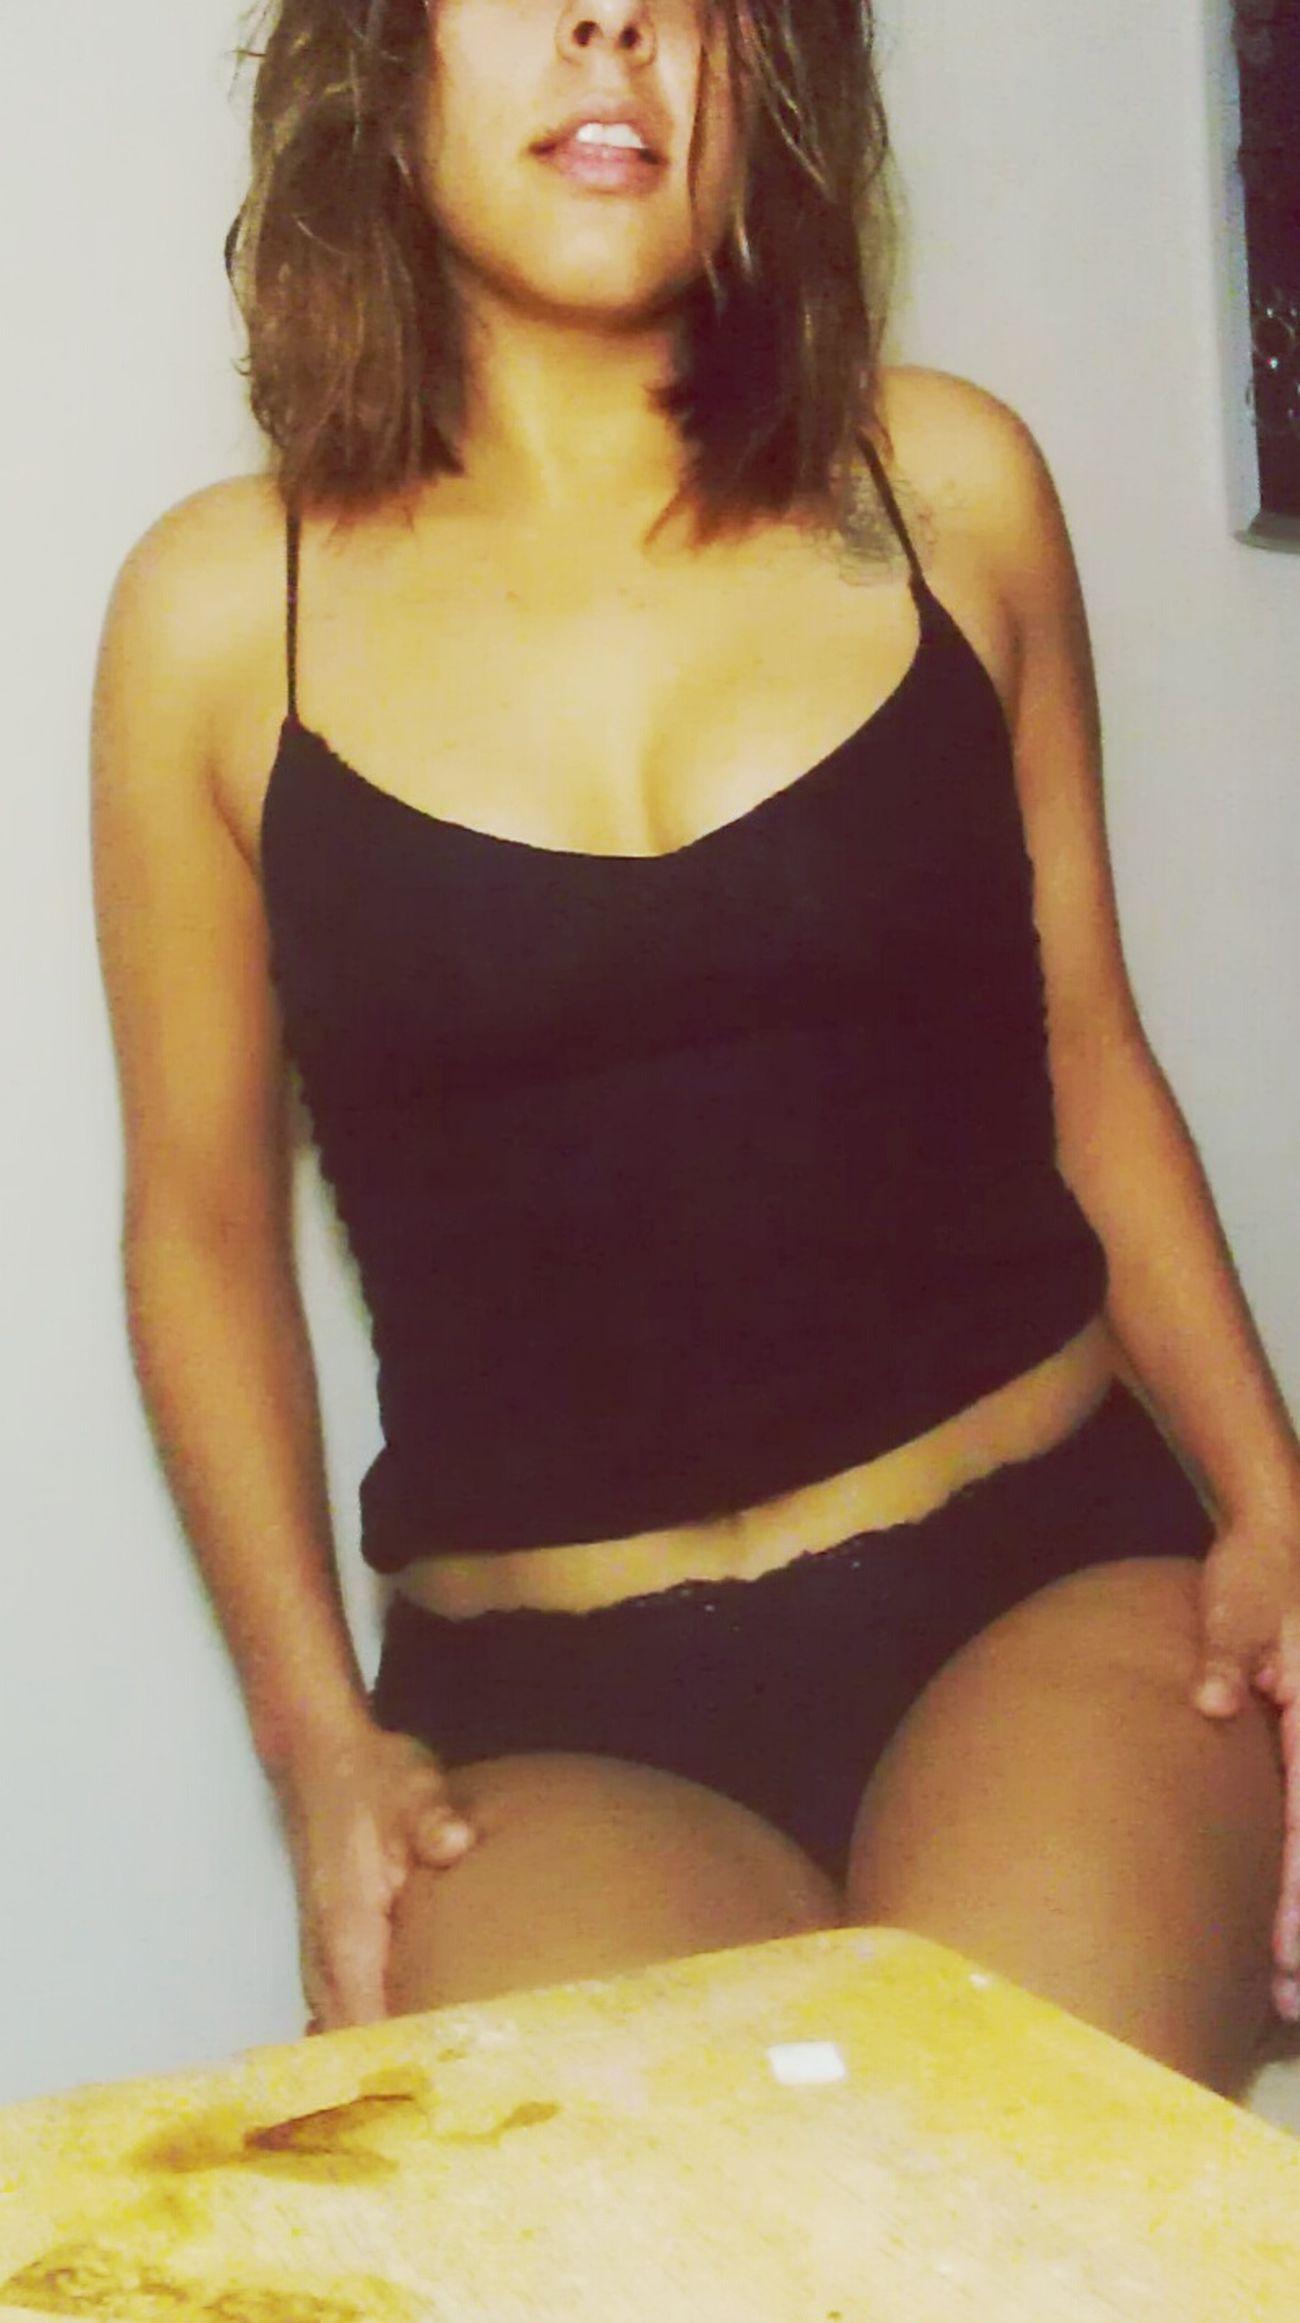 BLACK CLASSIC Sensual 💕 Black Tan That's Me Sexyblack Happybody My Legs